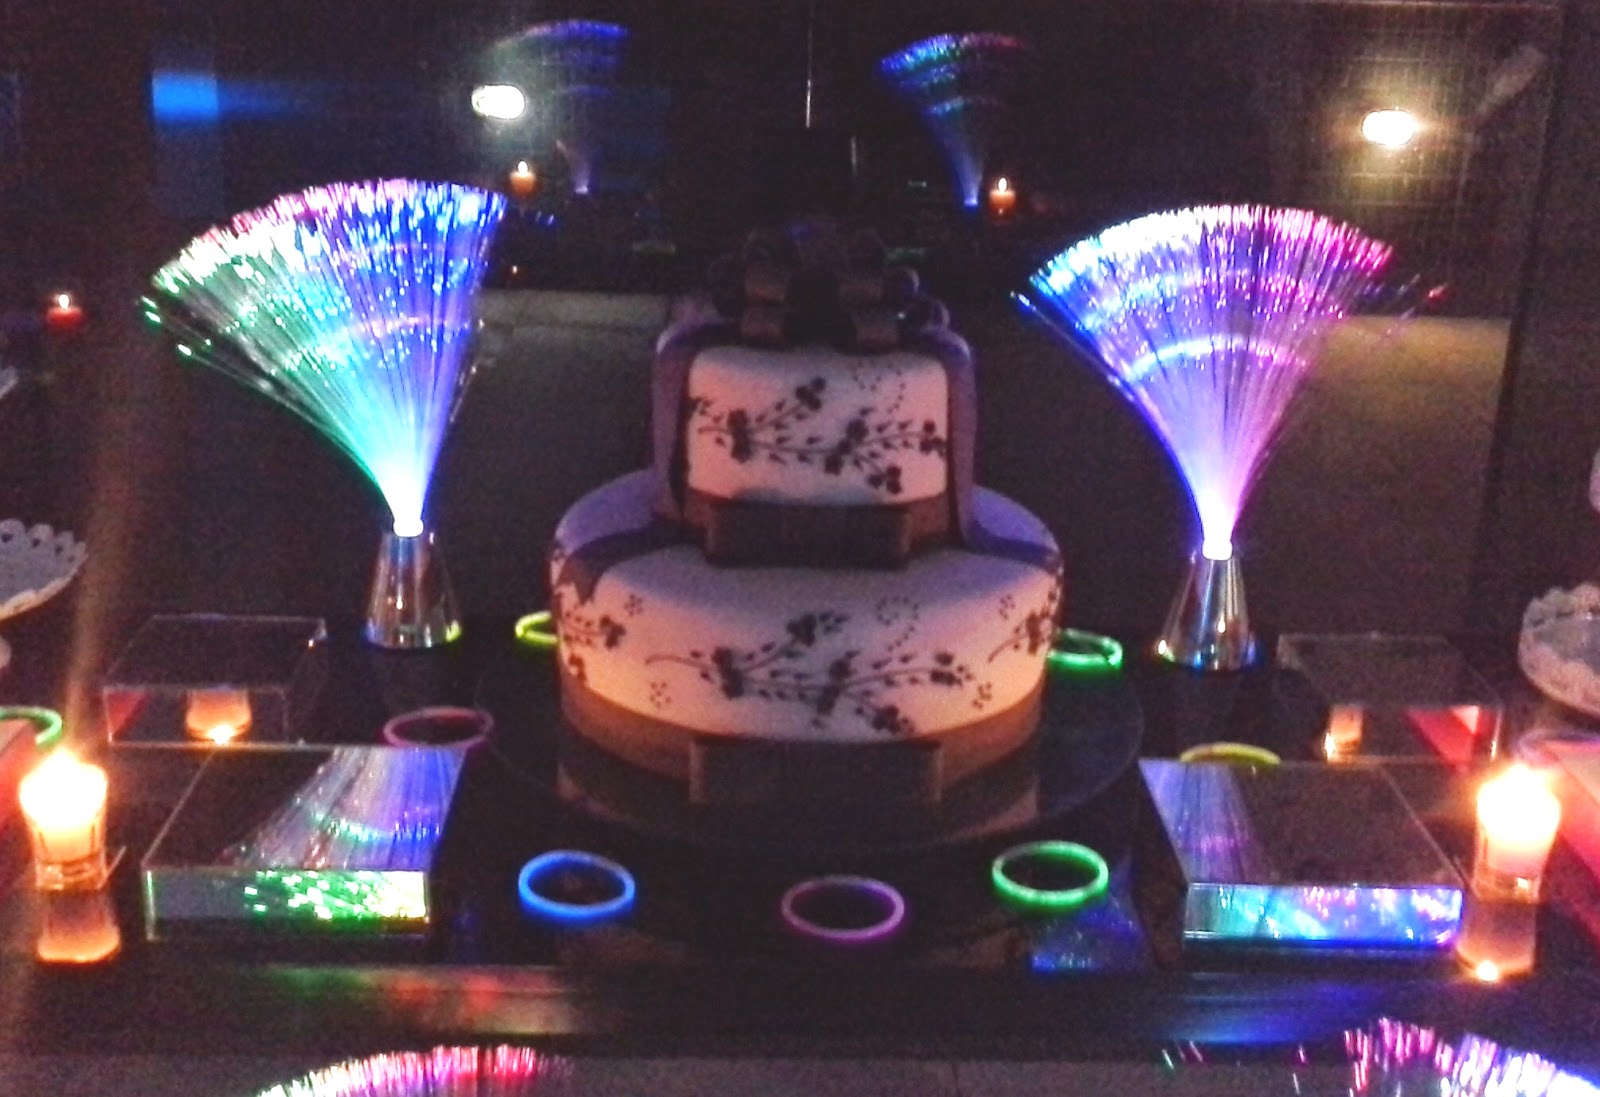 decoracao festa neon:ʚĭɞ DEcoração & Arte ʚĭɞ : Festa Neon